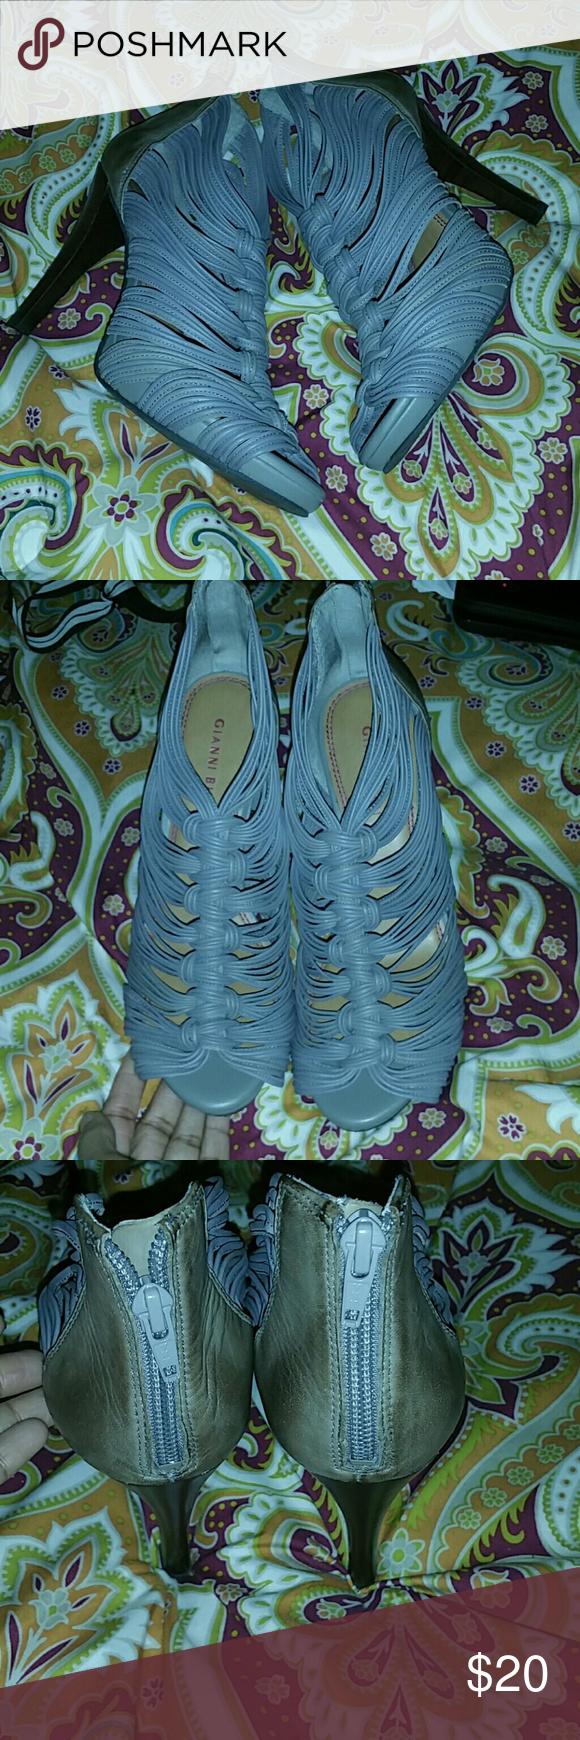 Gianni Bini strappy heels Gianni Bini strappy heels, sz 8.5, never worn/nwot,  leather upper, taupe colored Gianni Bini Shoes Heels